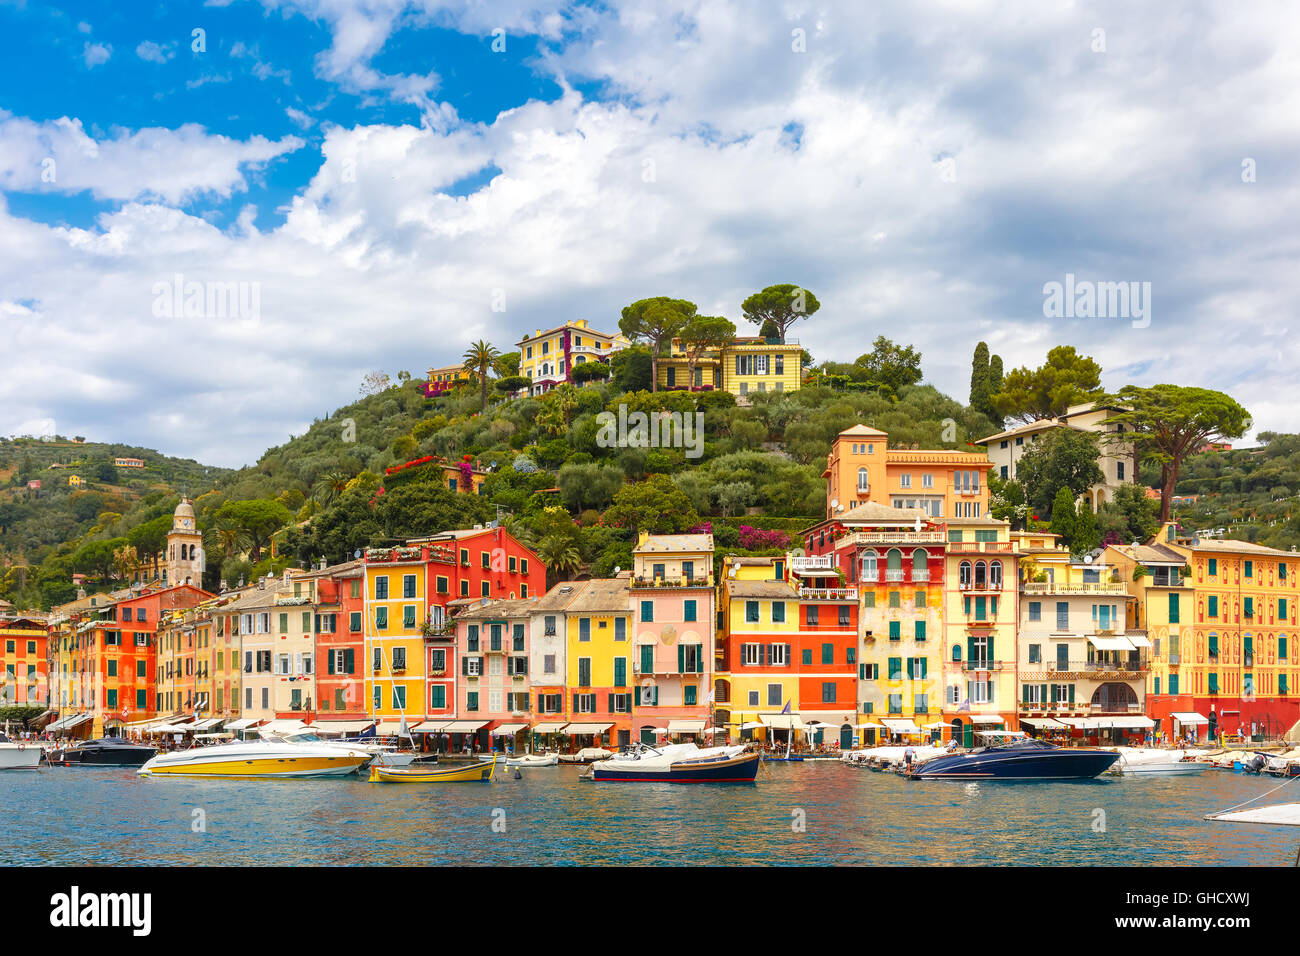 Panorama von Portofino, italienische Riviera, Ligurien Stockbild